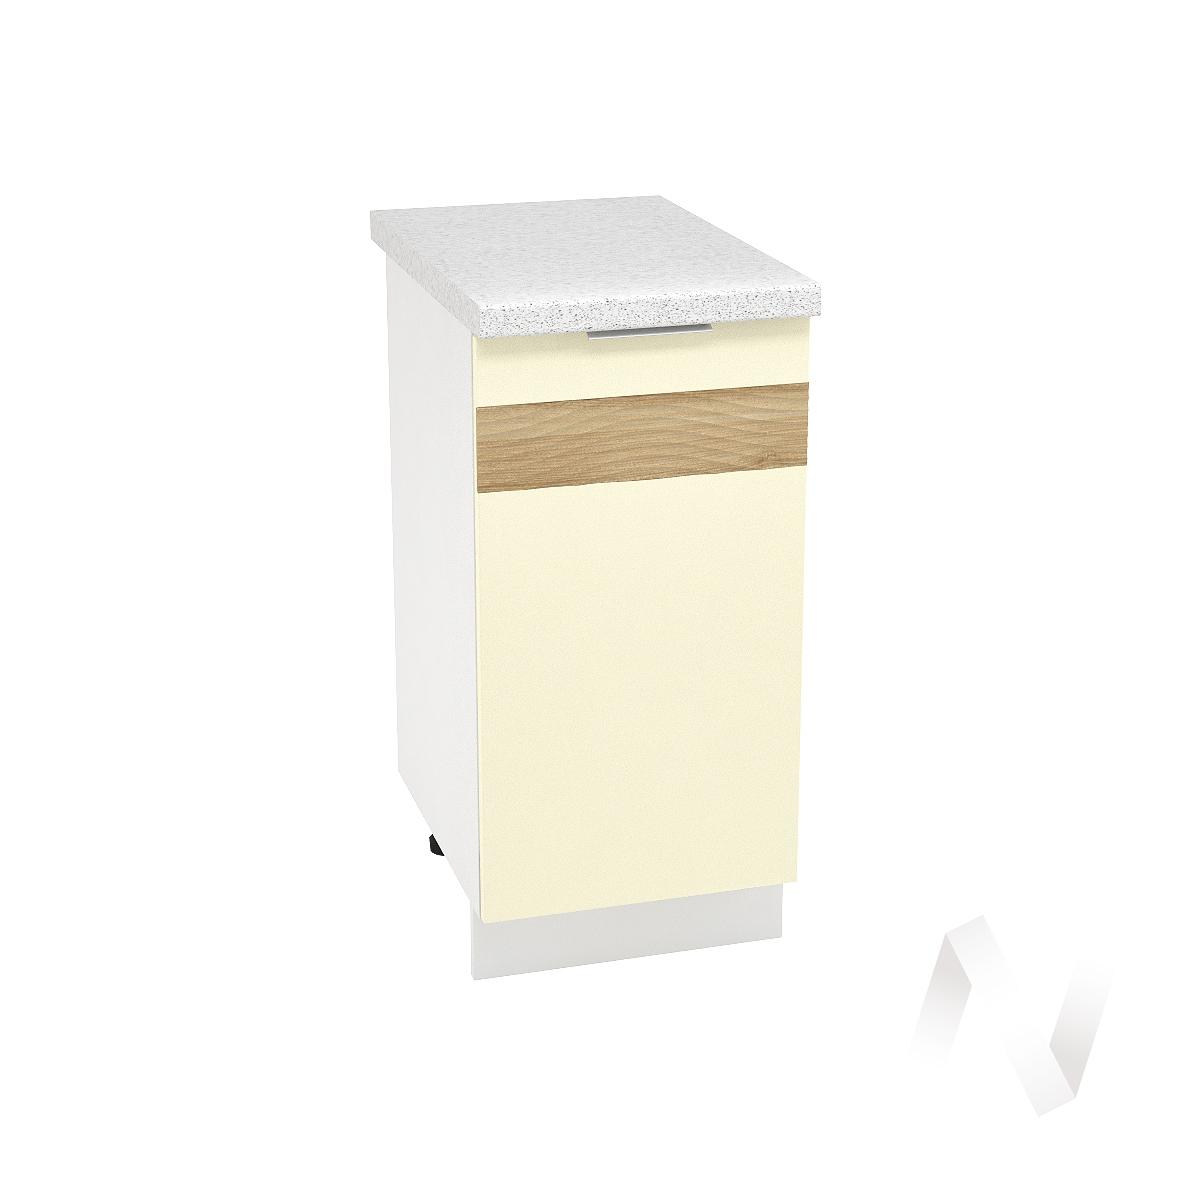 "Кухня ""Терра"": Шкаф нижний правый 400, ШН 400 (ваниль софт/корпус белый)"